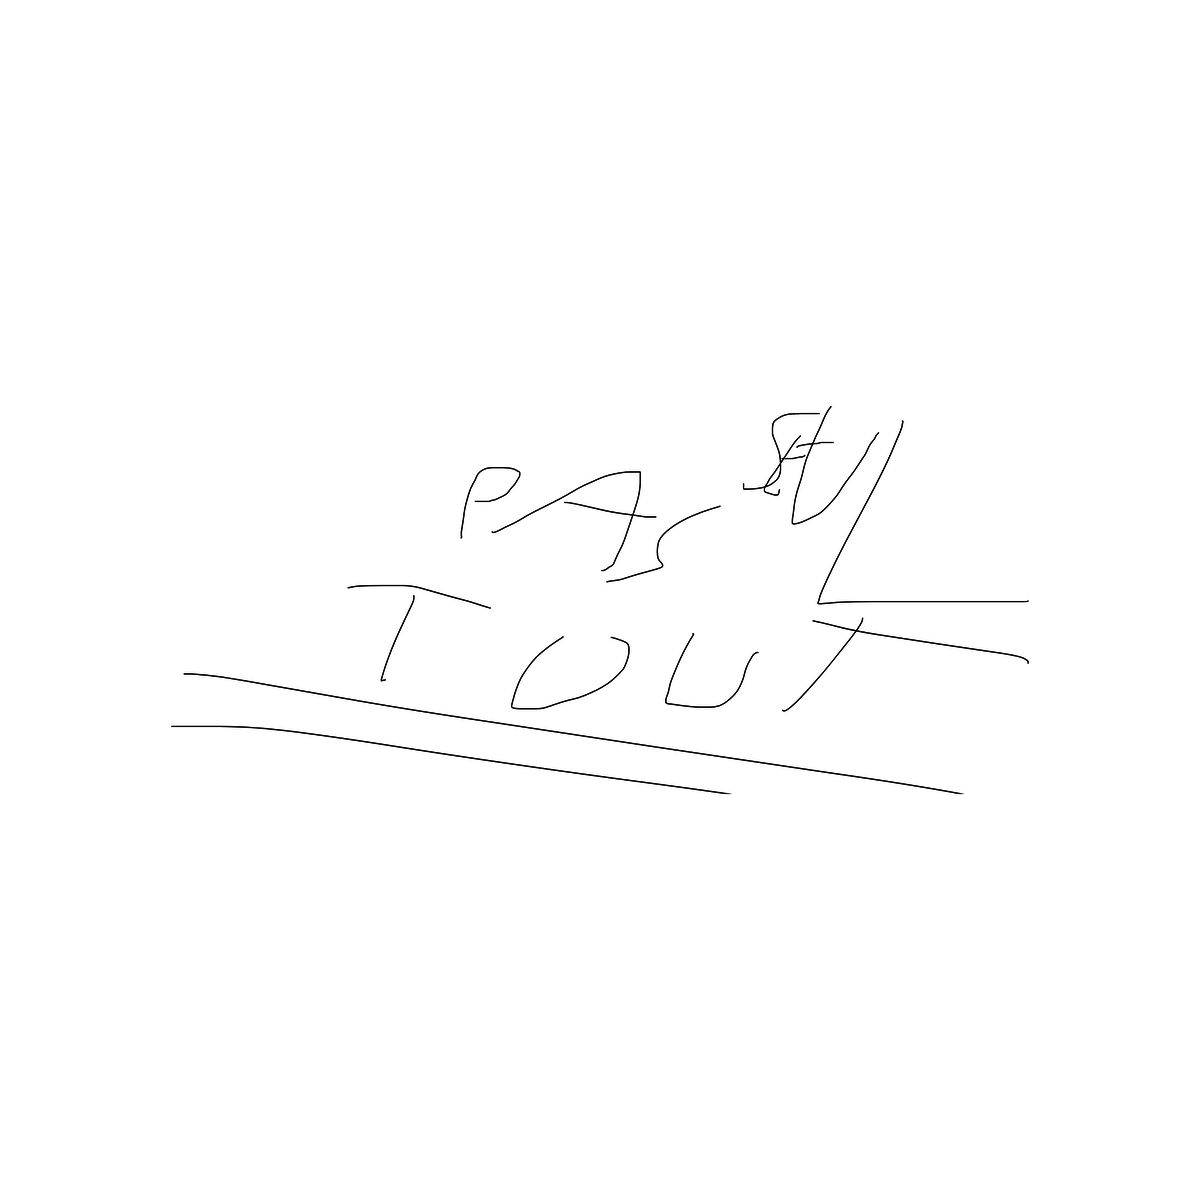 BAAAM drawing#23586 lat:43.4504318237304700lng: 4.9392914772033690